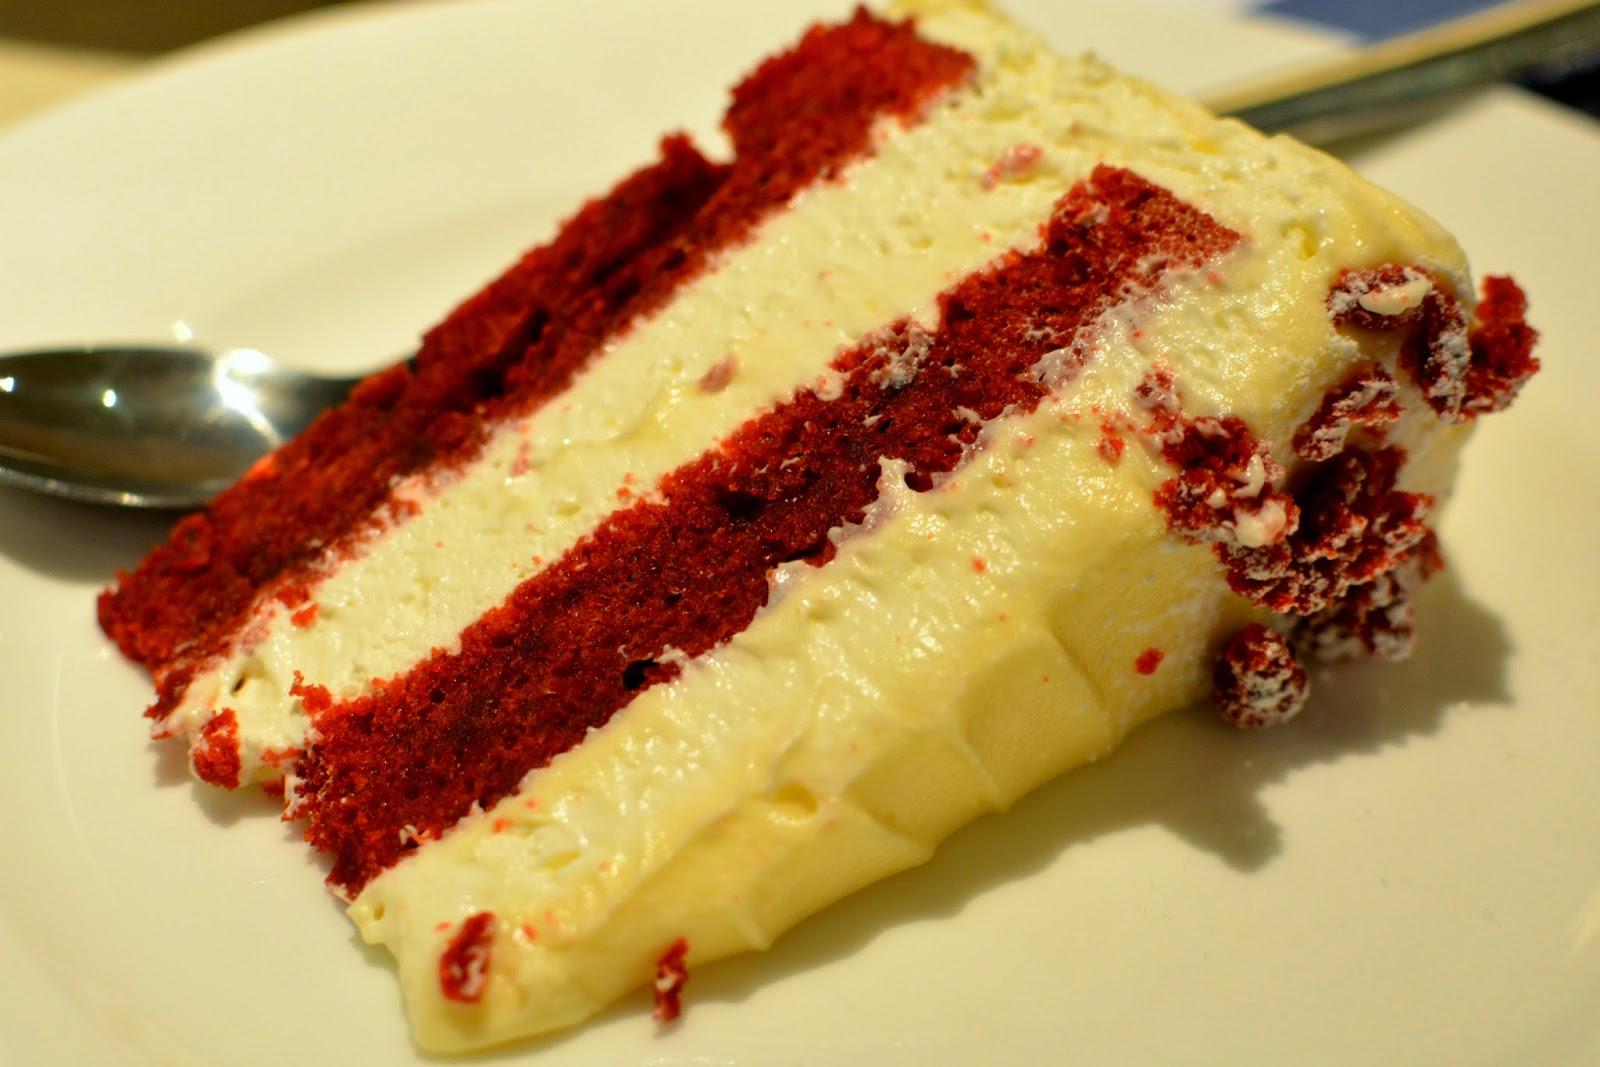 Eric Lanlard Red Velvet Cheesecake